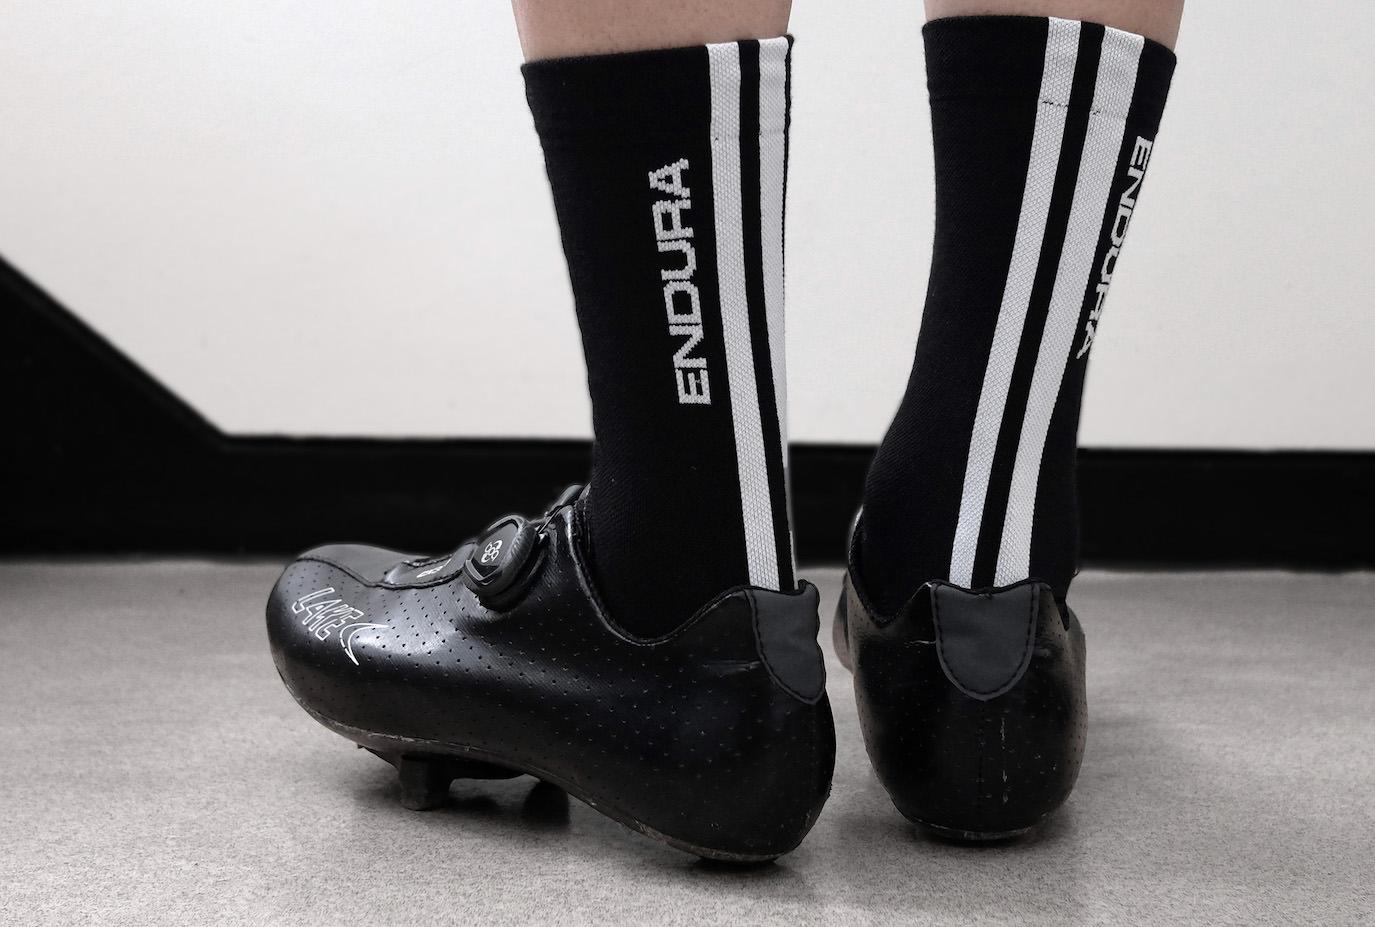 Pro SL PrimaLoft Sock 着用イメージ